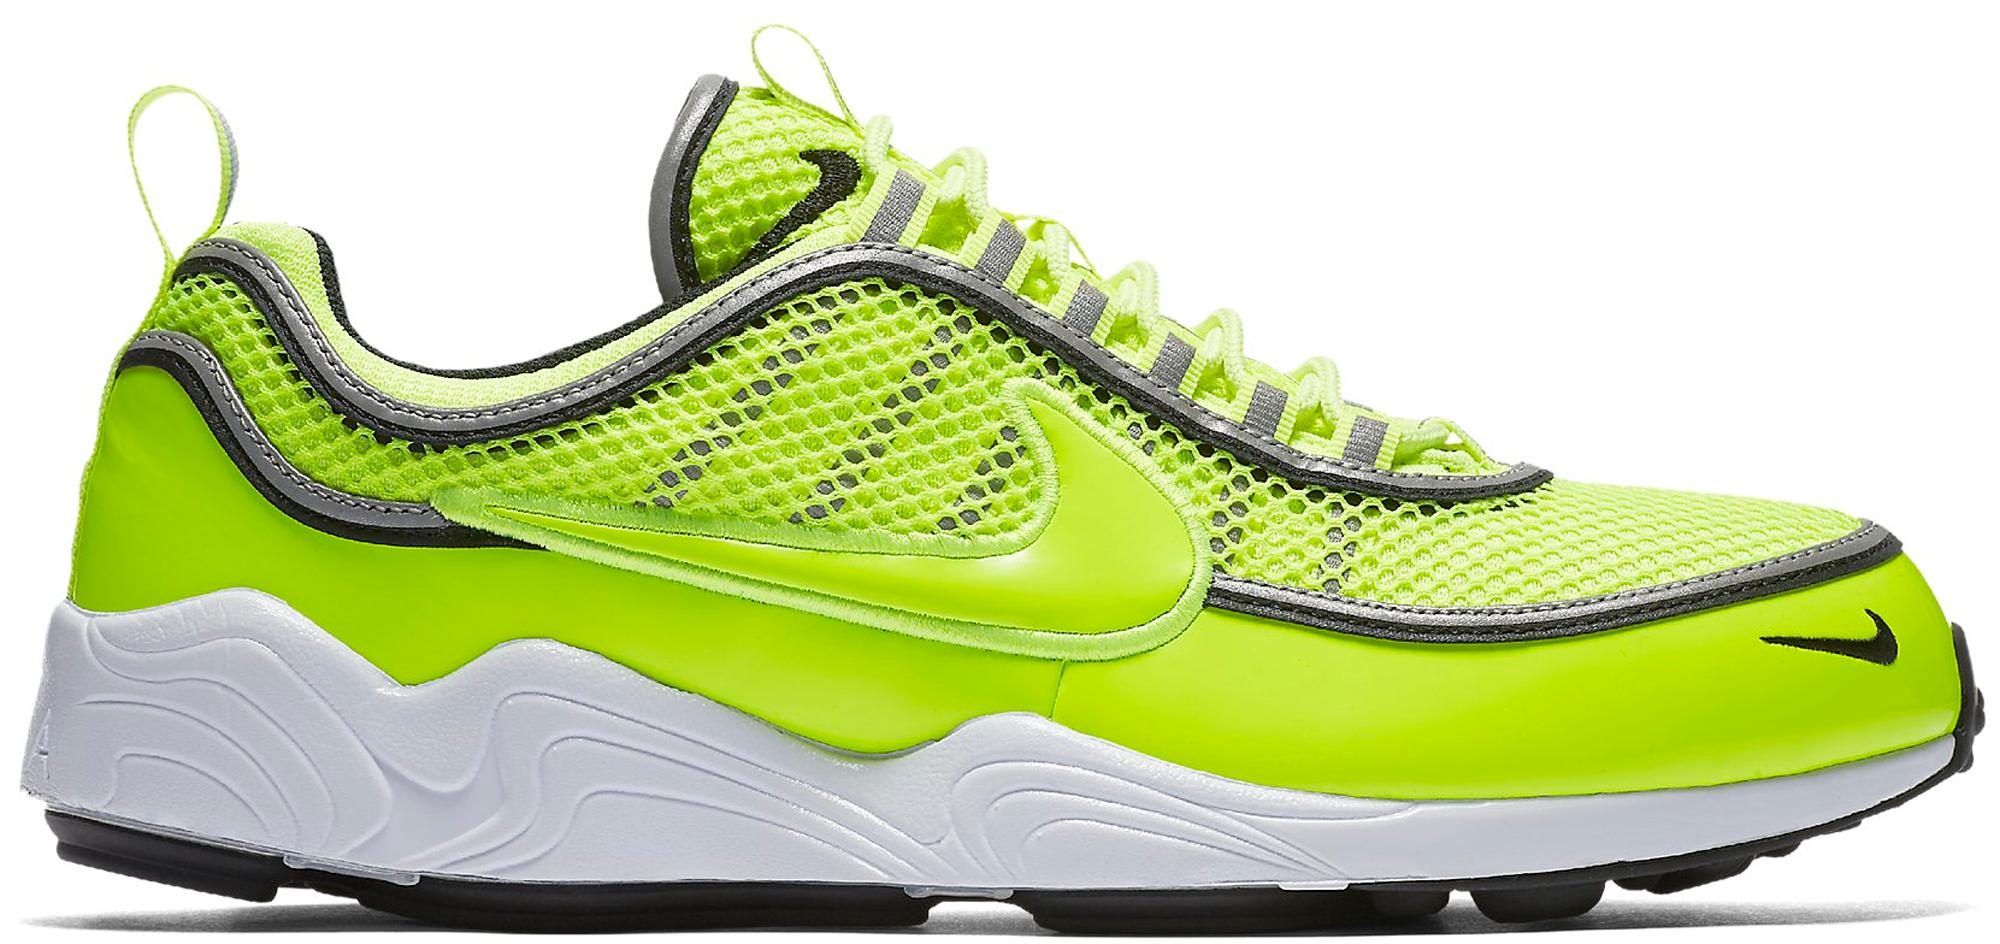 Nike Air Zoom Spiridon 16 Volt - 926955-700